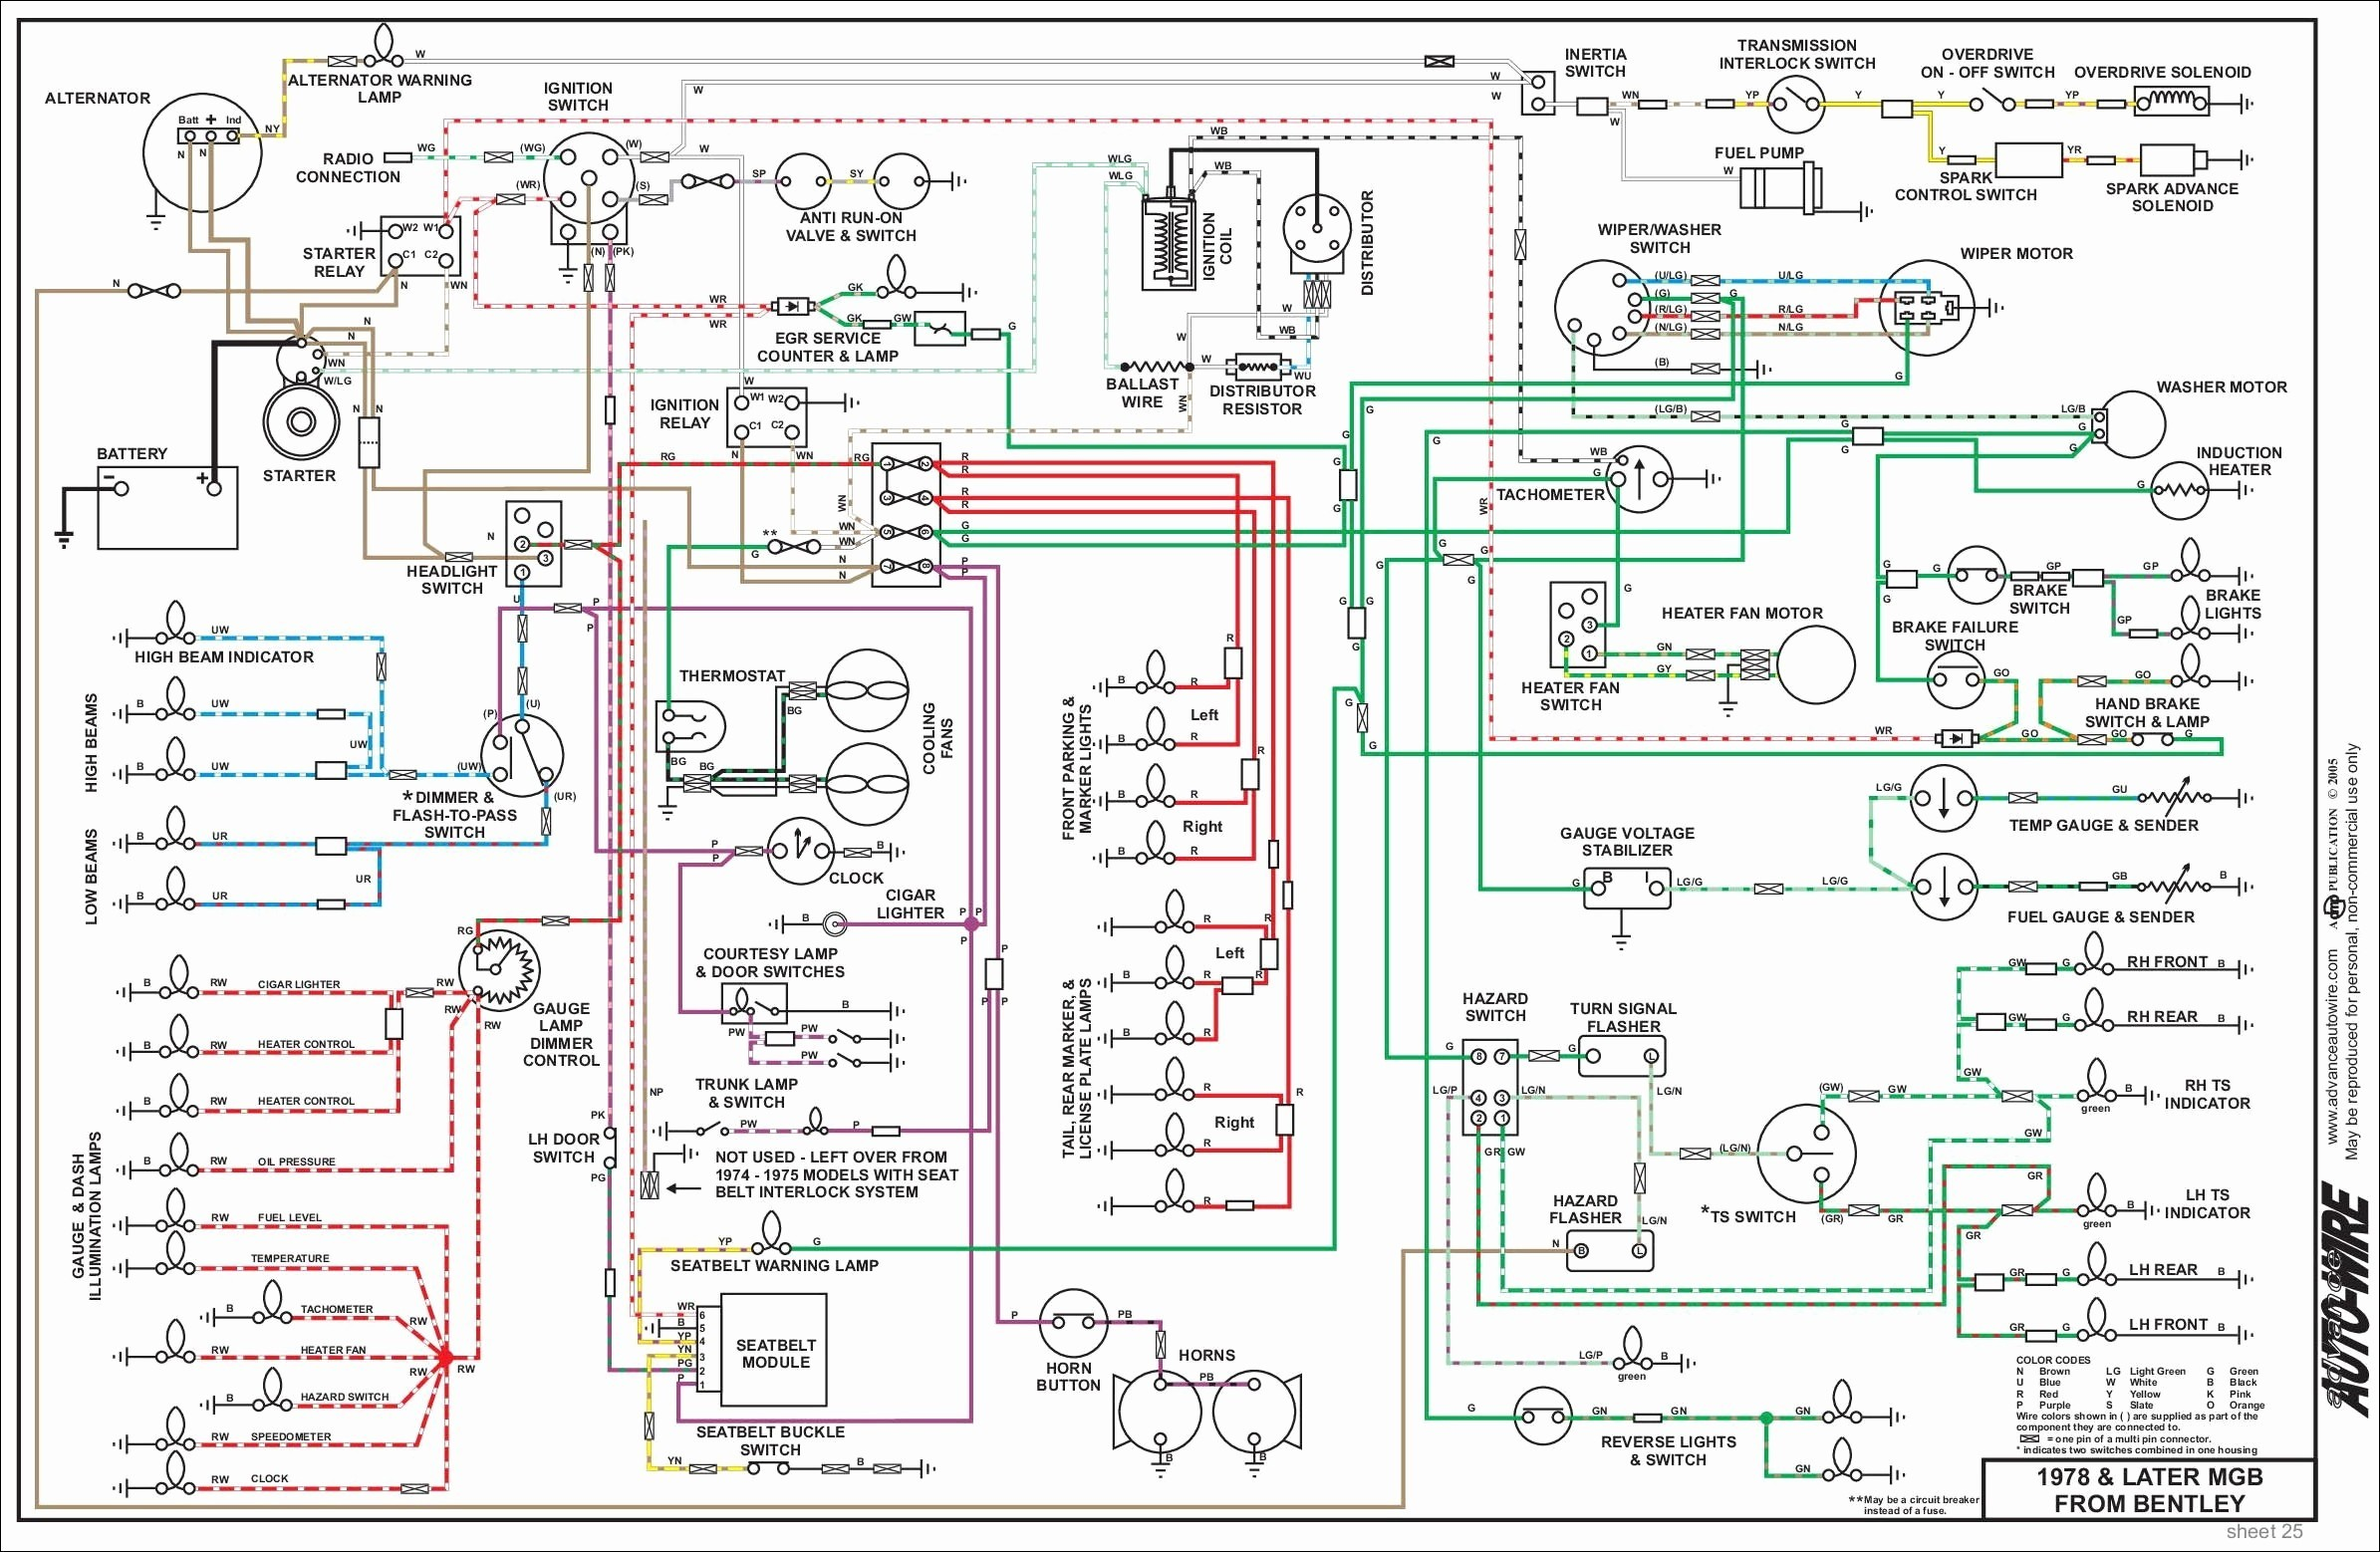 Ebike Wiring Diagram Inspirational | Wiring Diagram Image